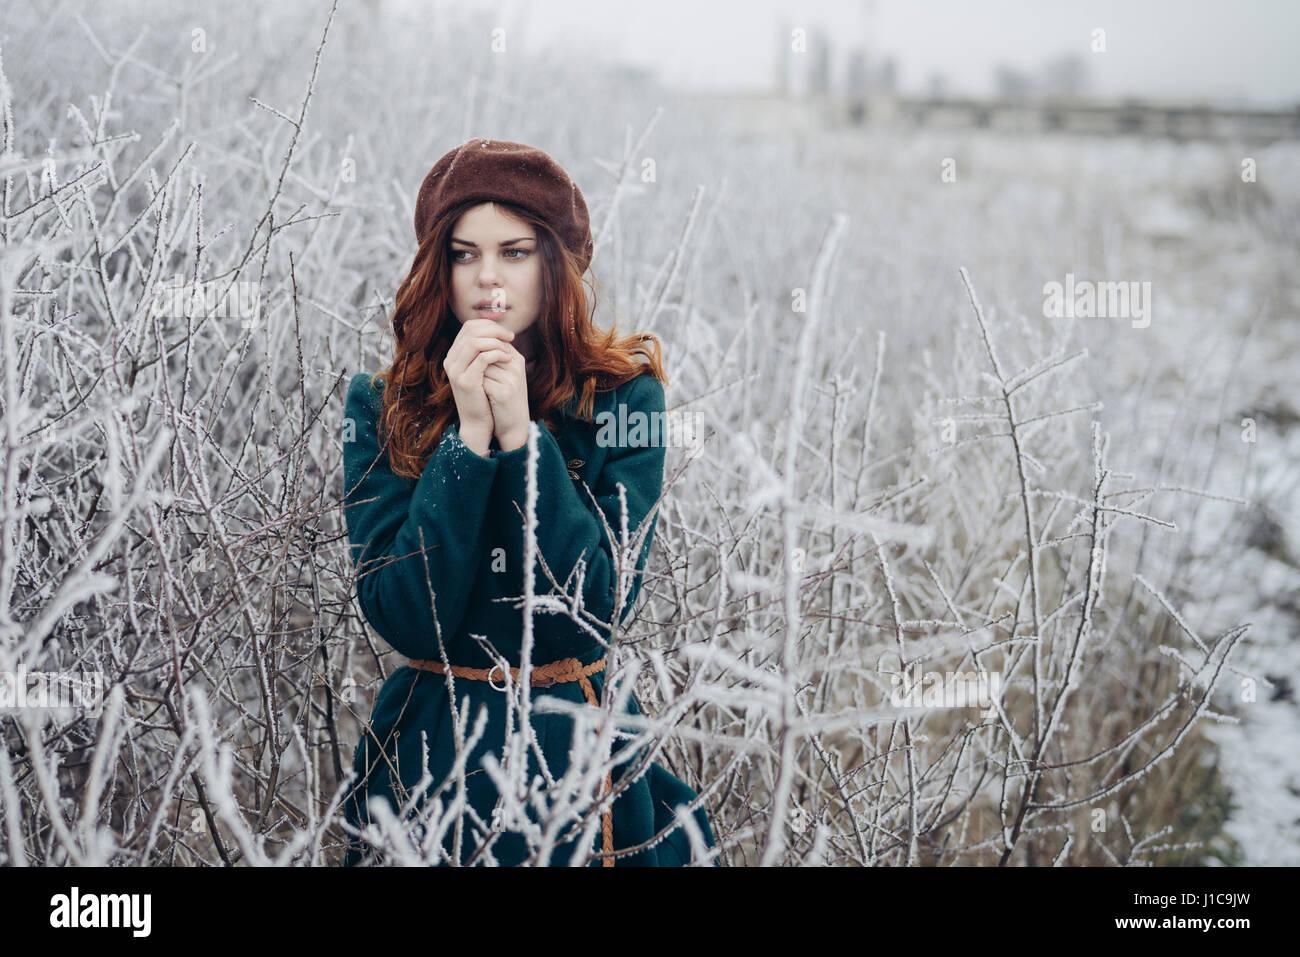 Caucasian woman rubbing hands in winter field - Stock Image